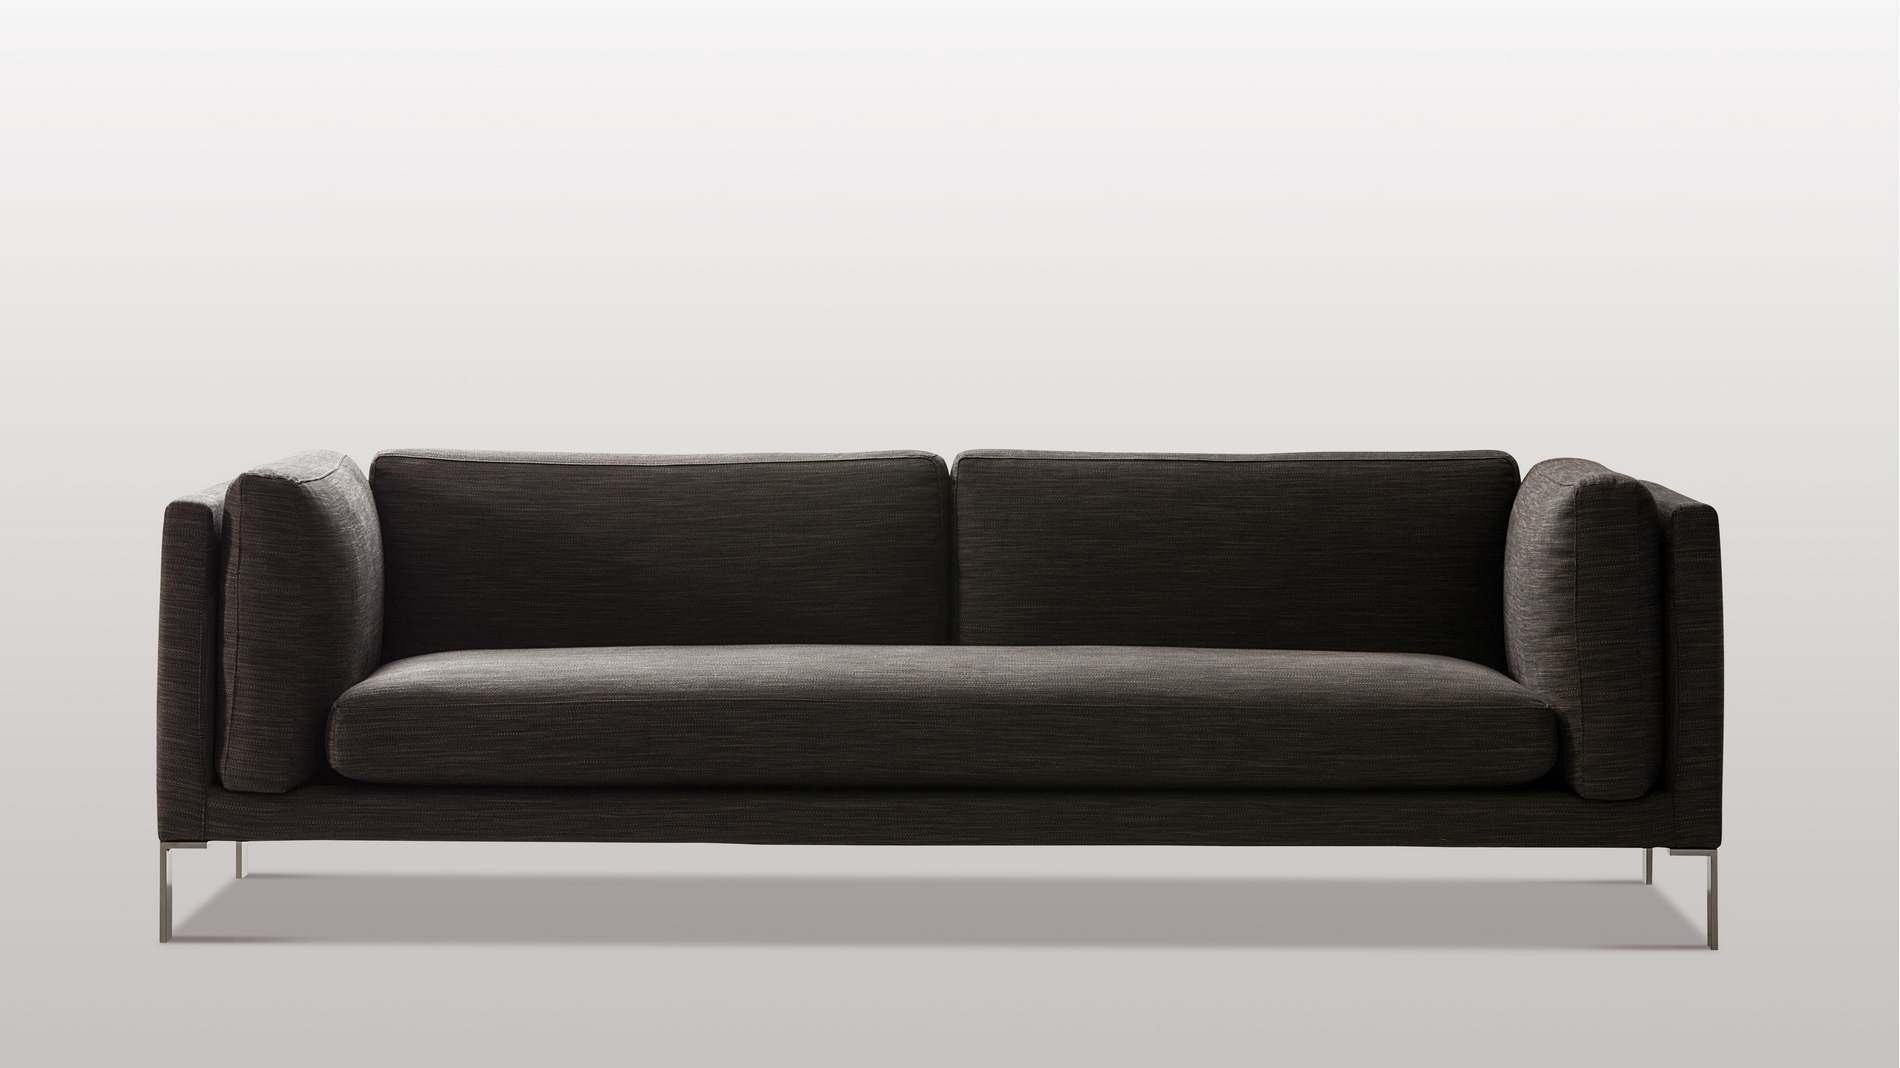 Divano Angolare 230 X 230.Divani Moderni Laica Divani